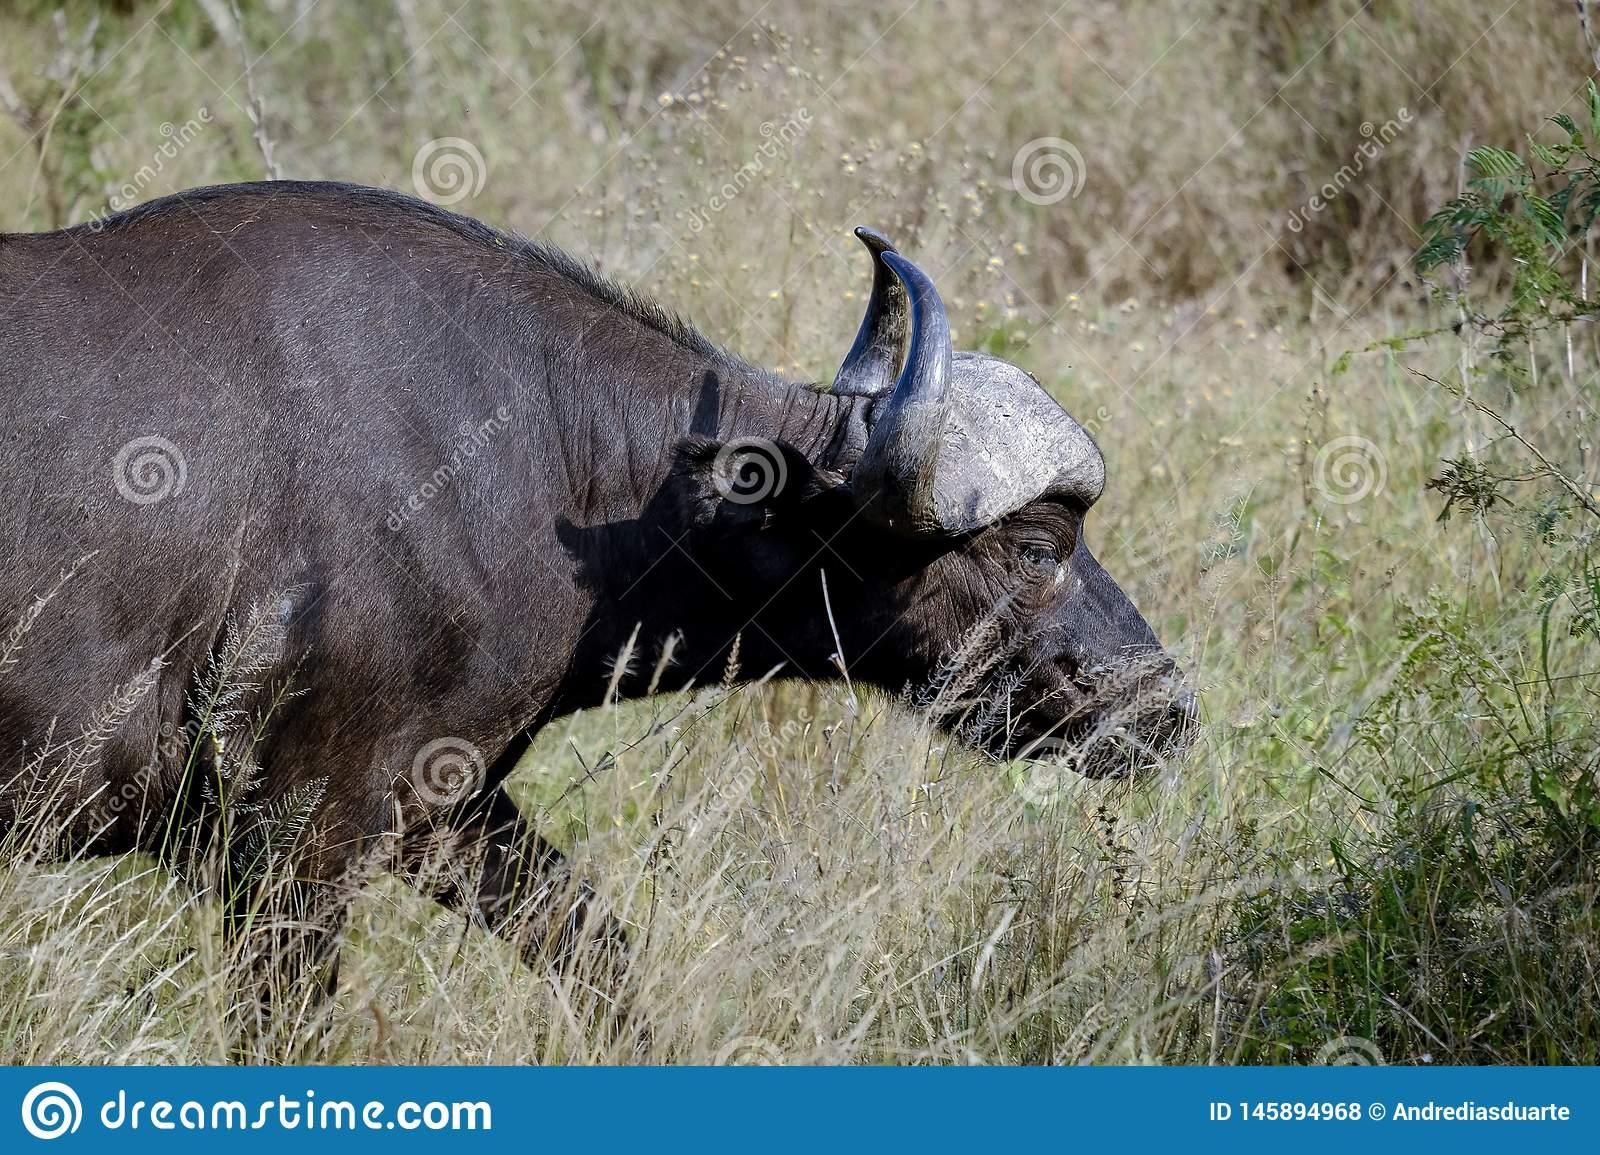 Азиатский буйвол, индийский буйвол место обитания условия для жизни применение в хозяйстве